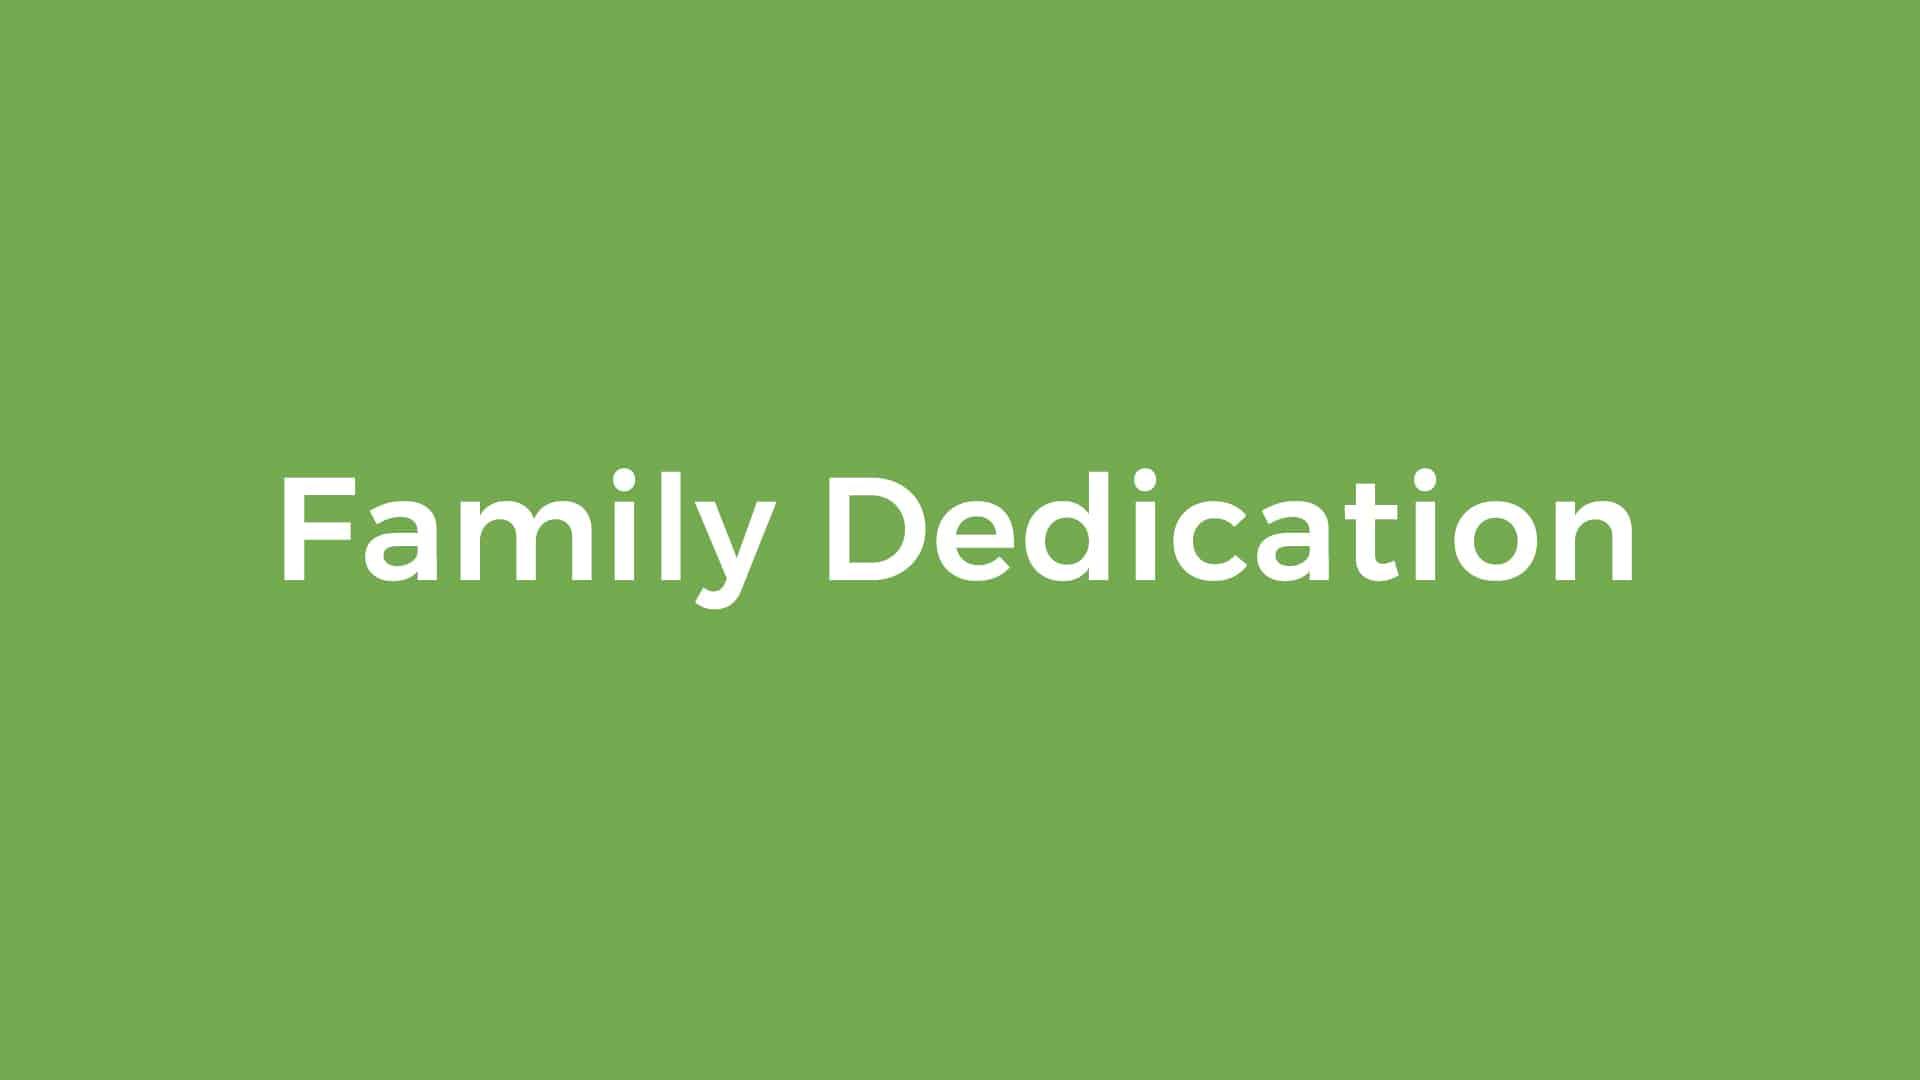 hoffmantownkids-familydedication-2